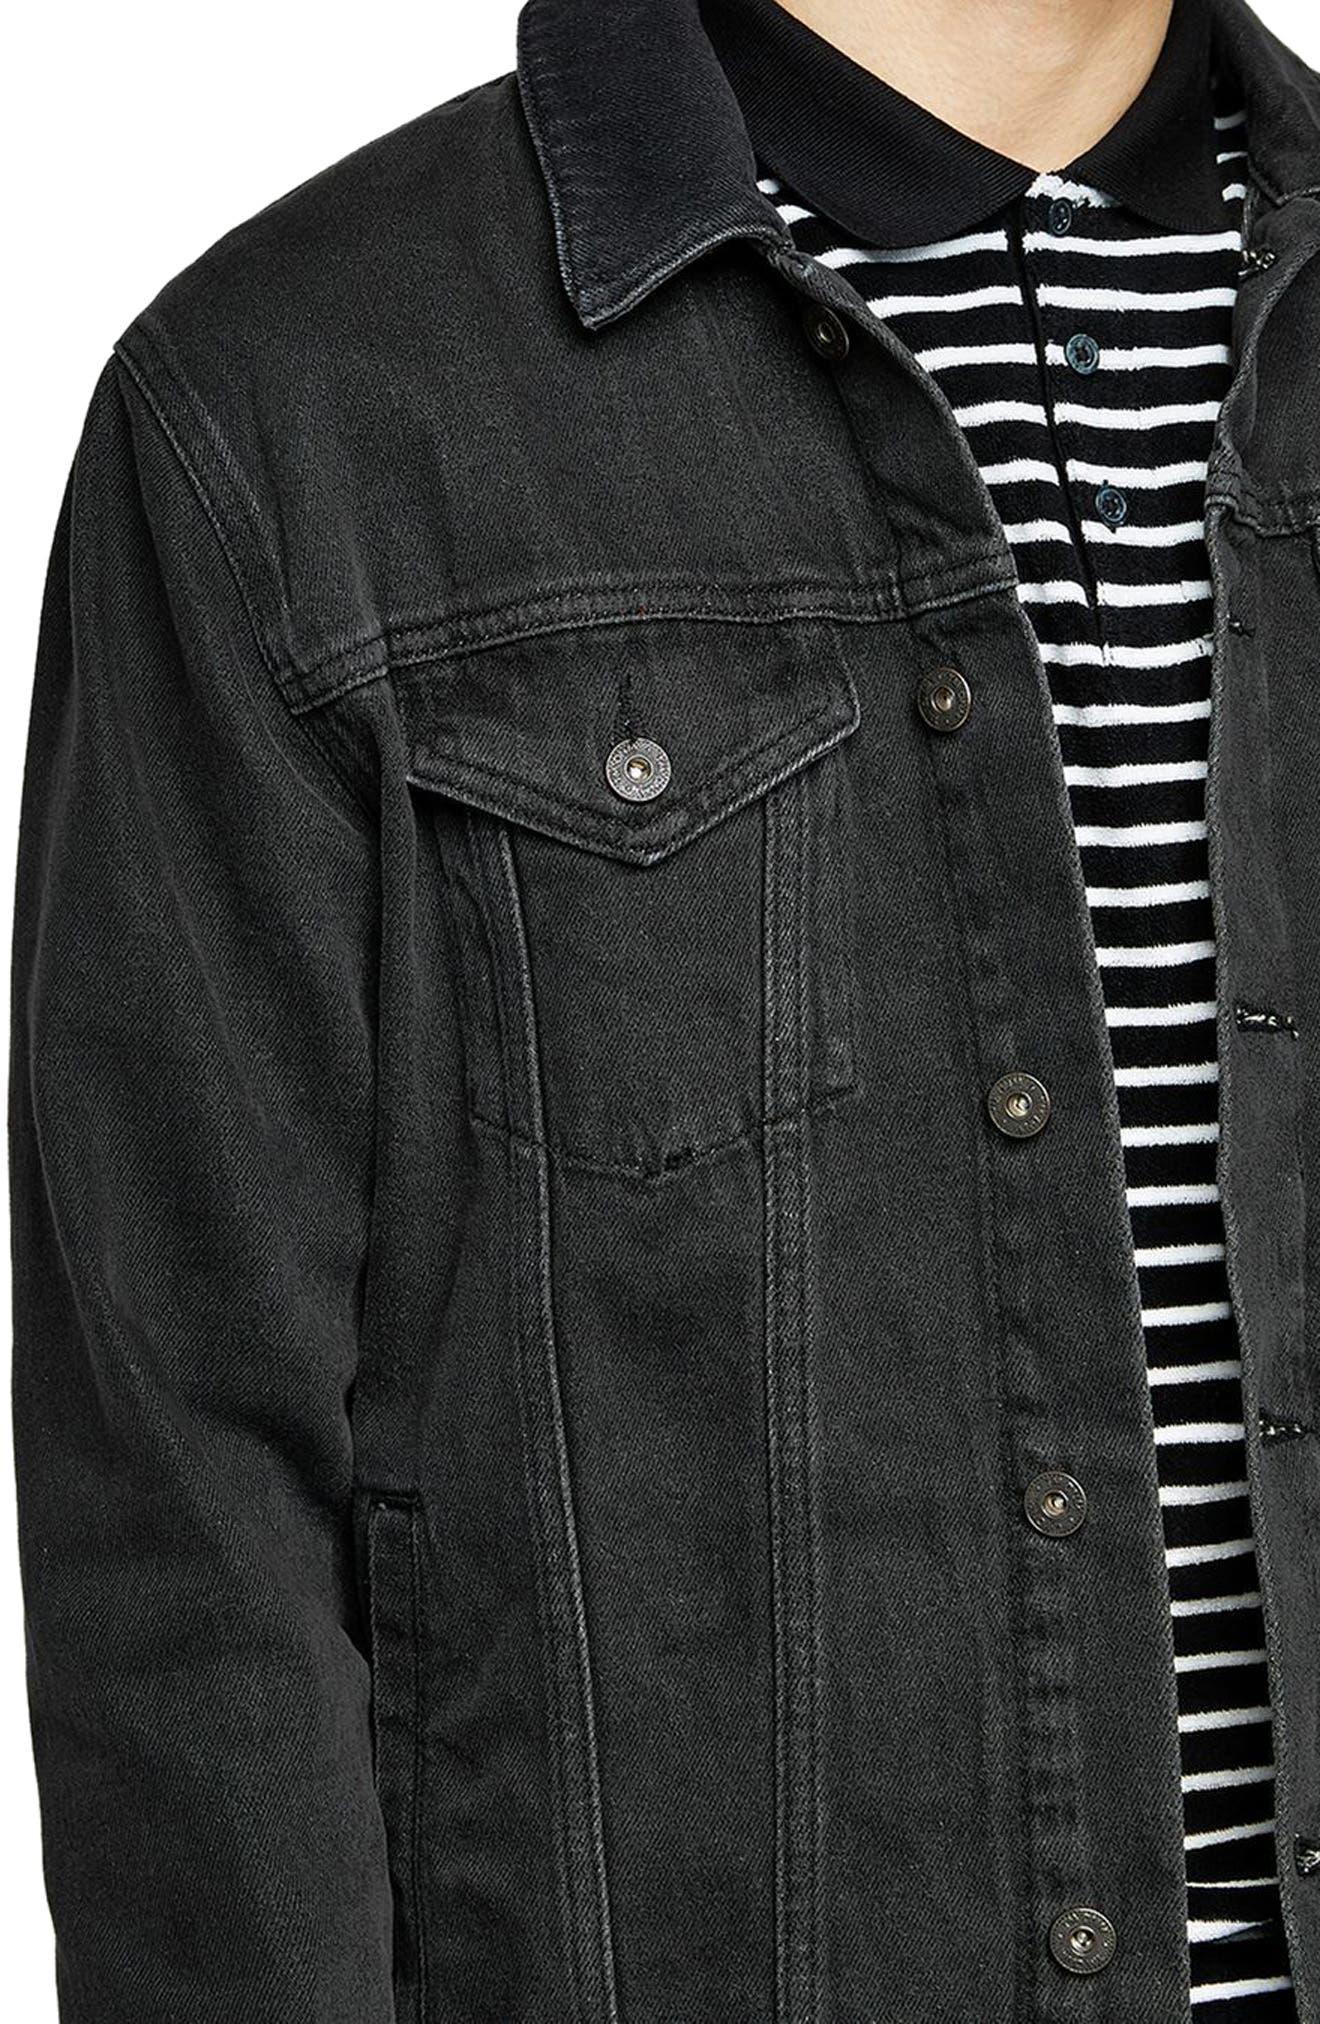 Western Denim Jacket,                             Alternate thumbnail 3, color,                             Black